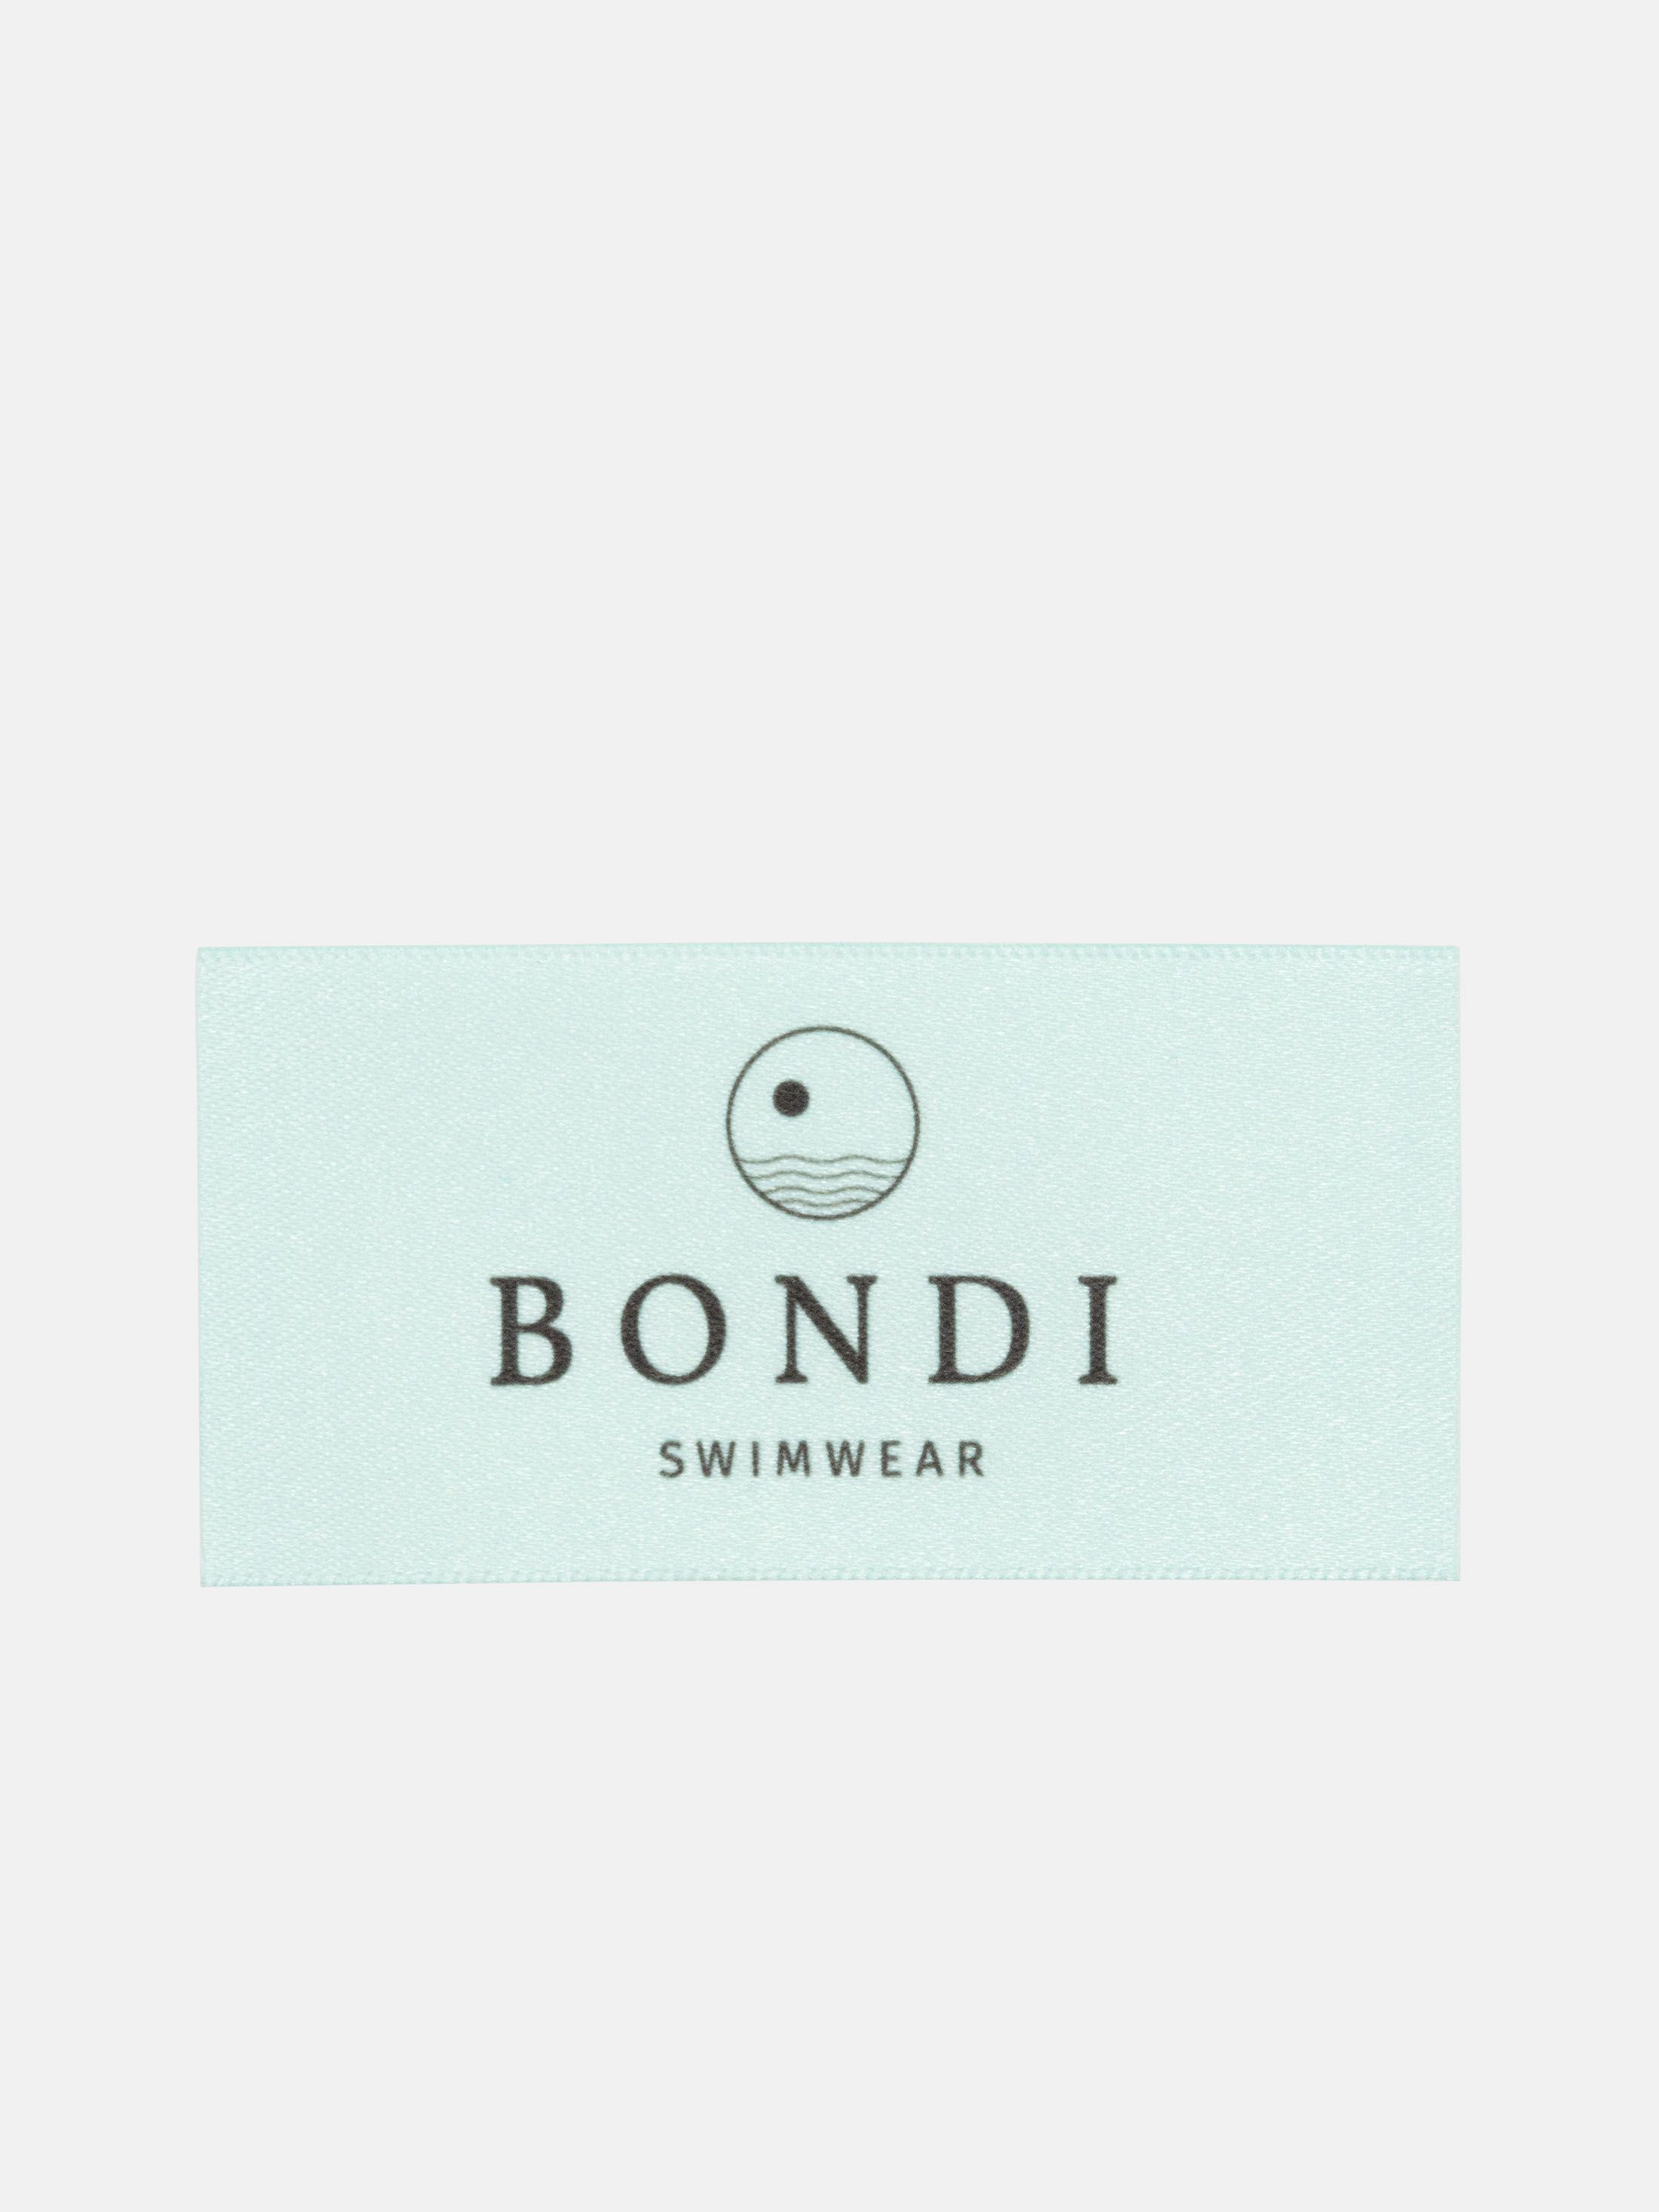 Custom Clothing Labels printed